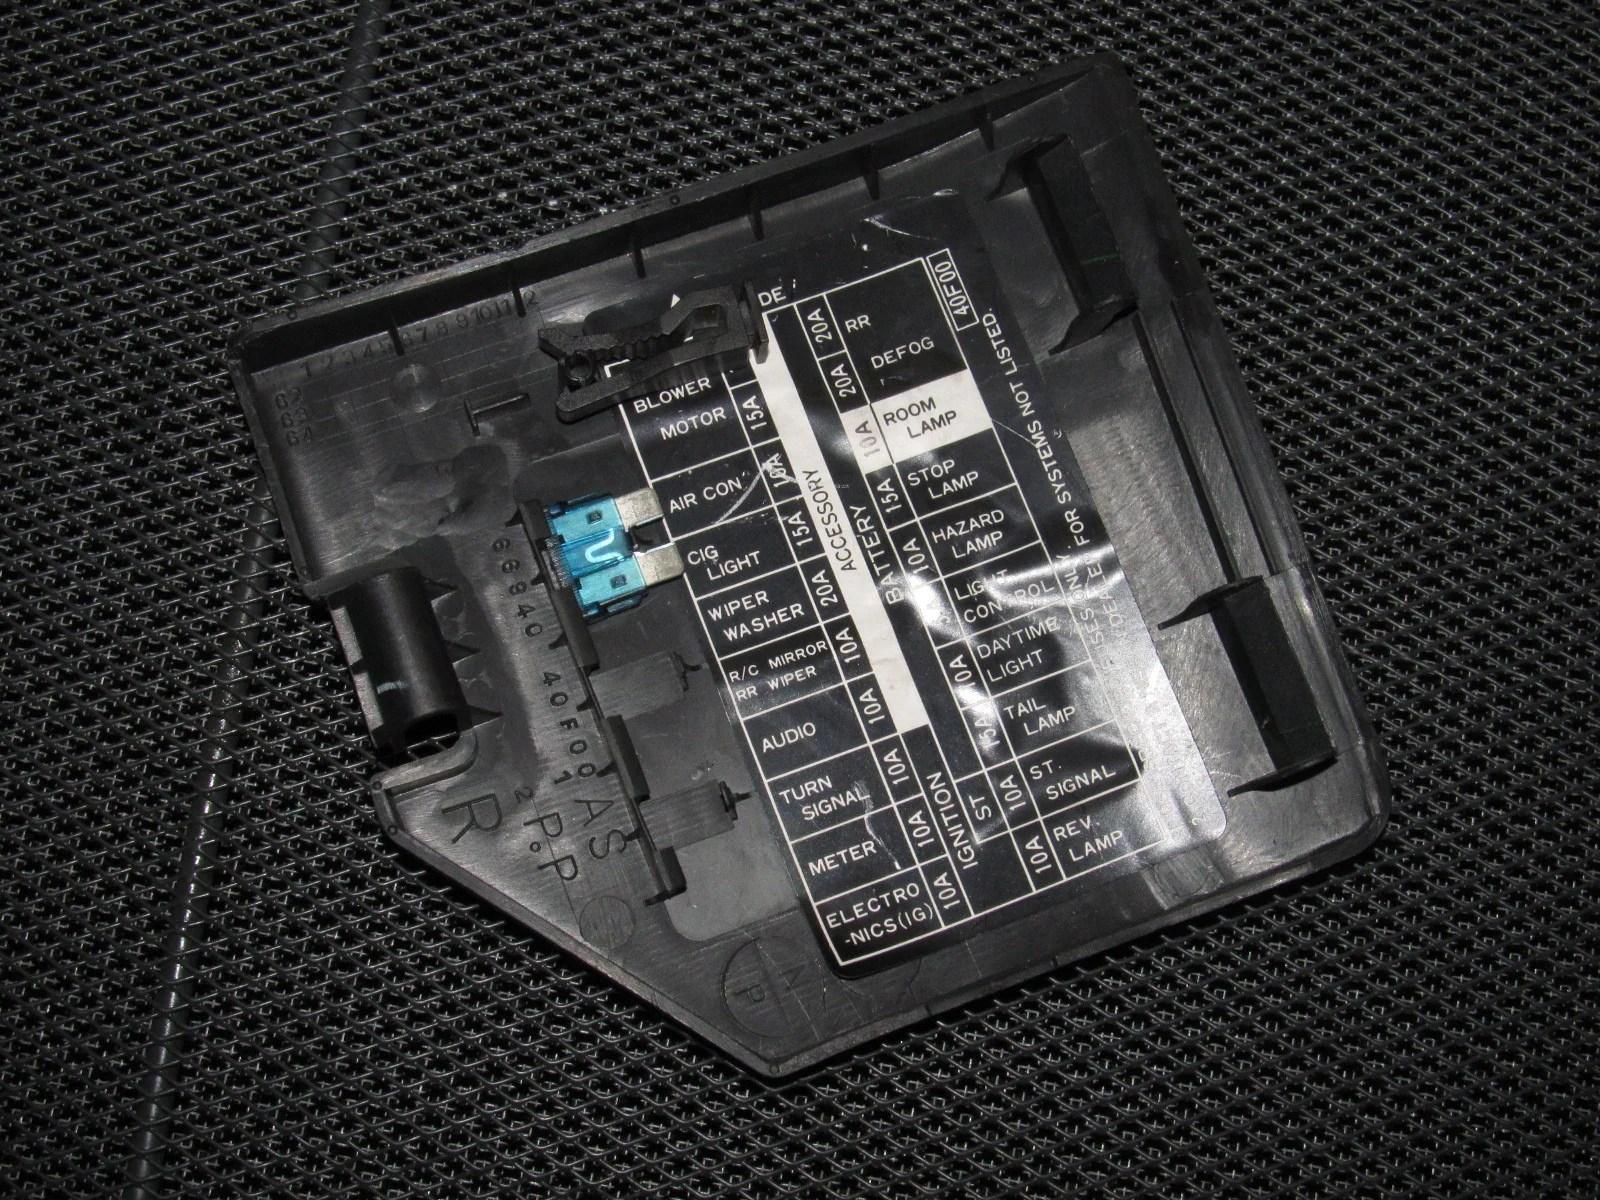 90 240sx Fuse Box Cover Auto Electrical Wiring Diagram Sr20det